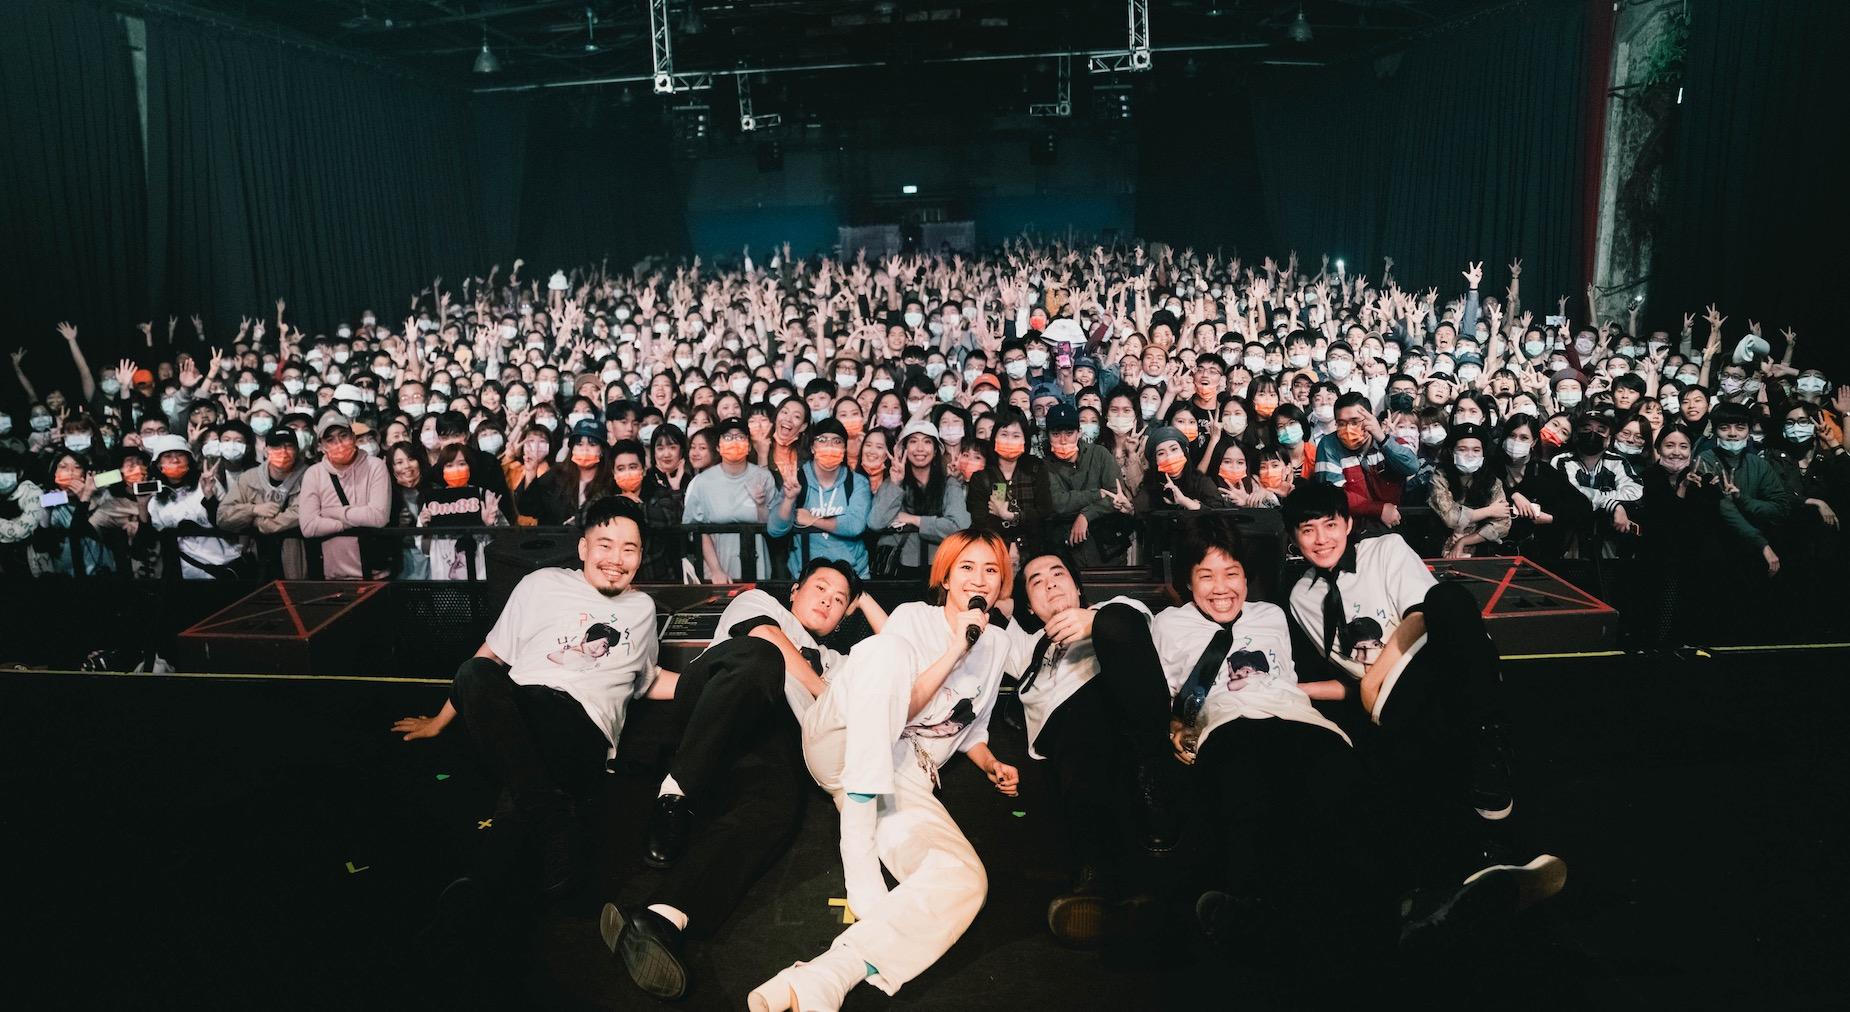 9m88「情緒勒索」歌迷購票 放話唱進小巨蛋!